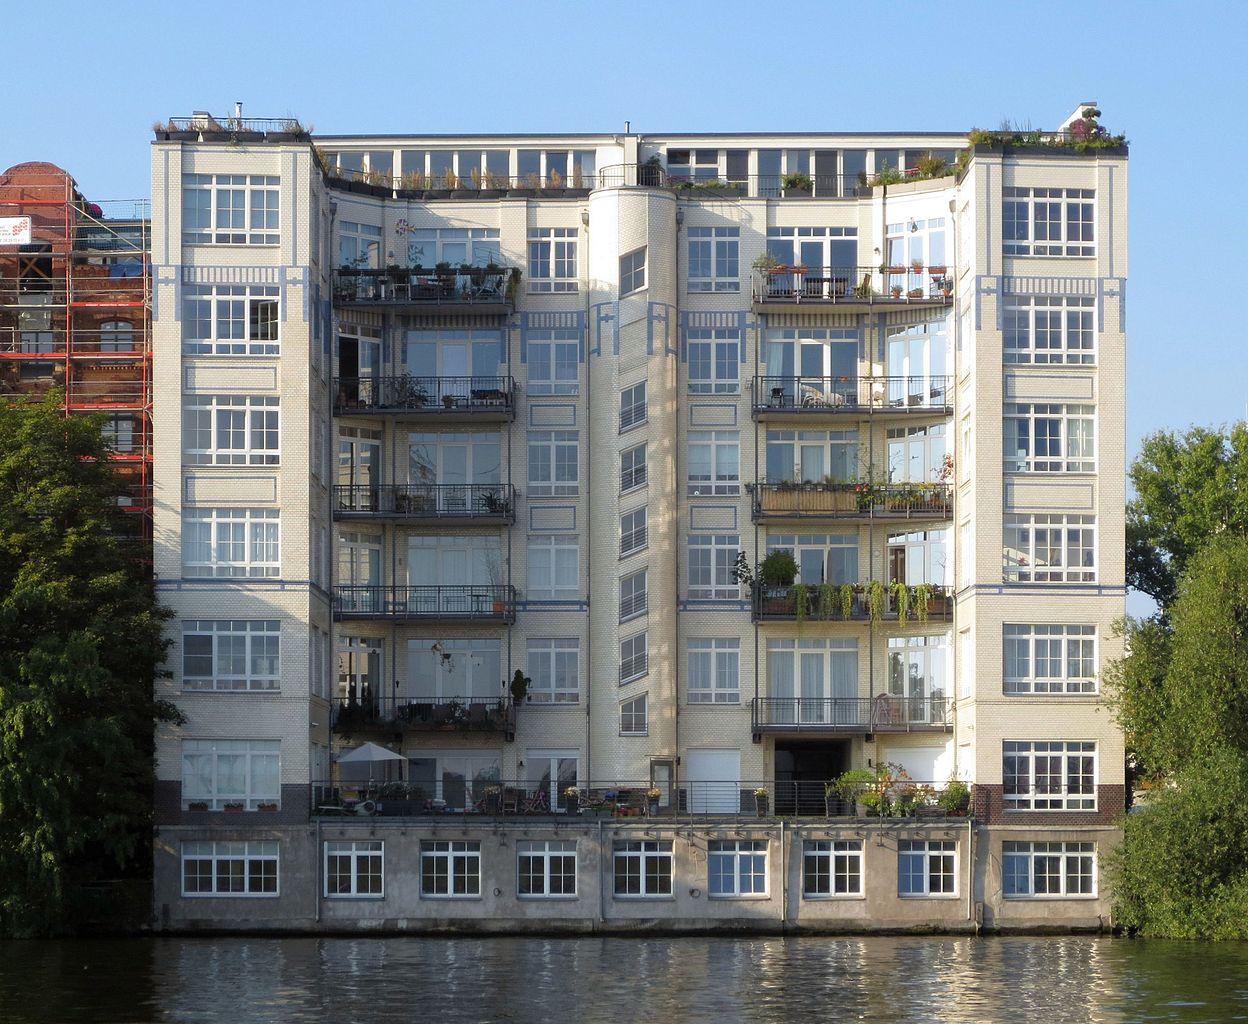 datei berlin kreuzberg koepenicker strasse 10a mietshaus und gewerbehof. Black Bedroom Furniture Sets. Home Design Ideas